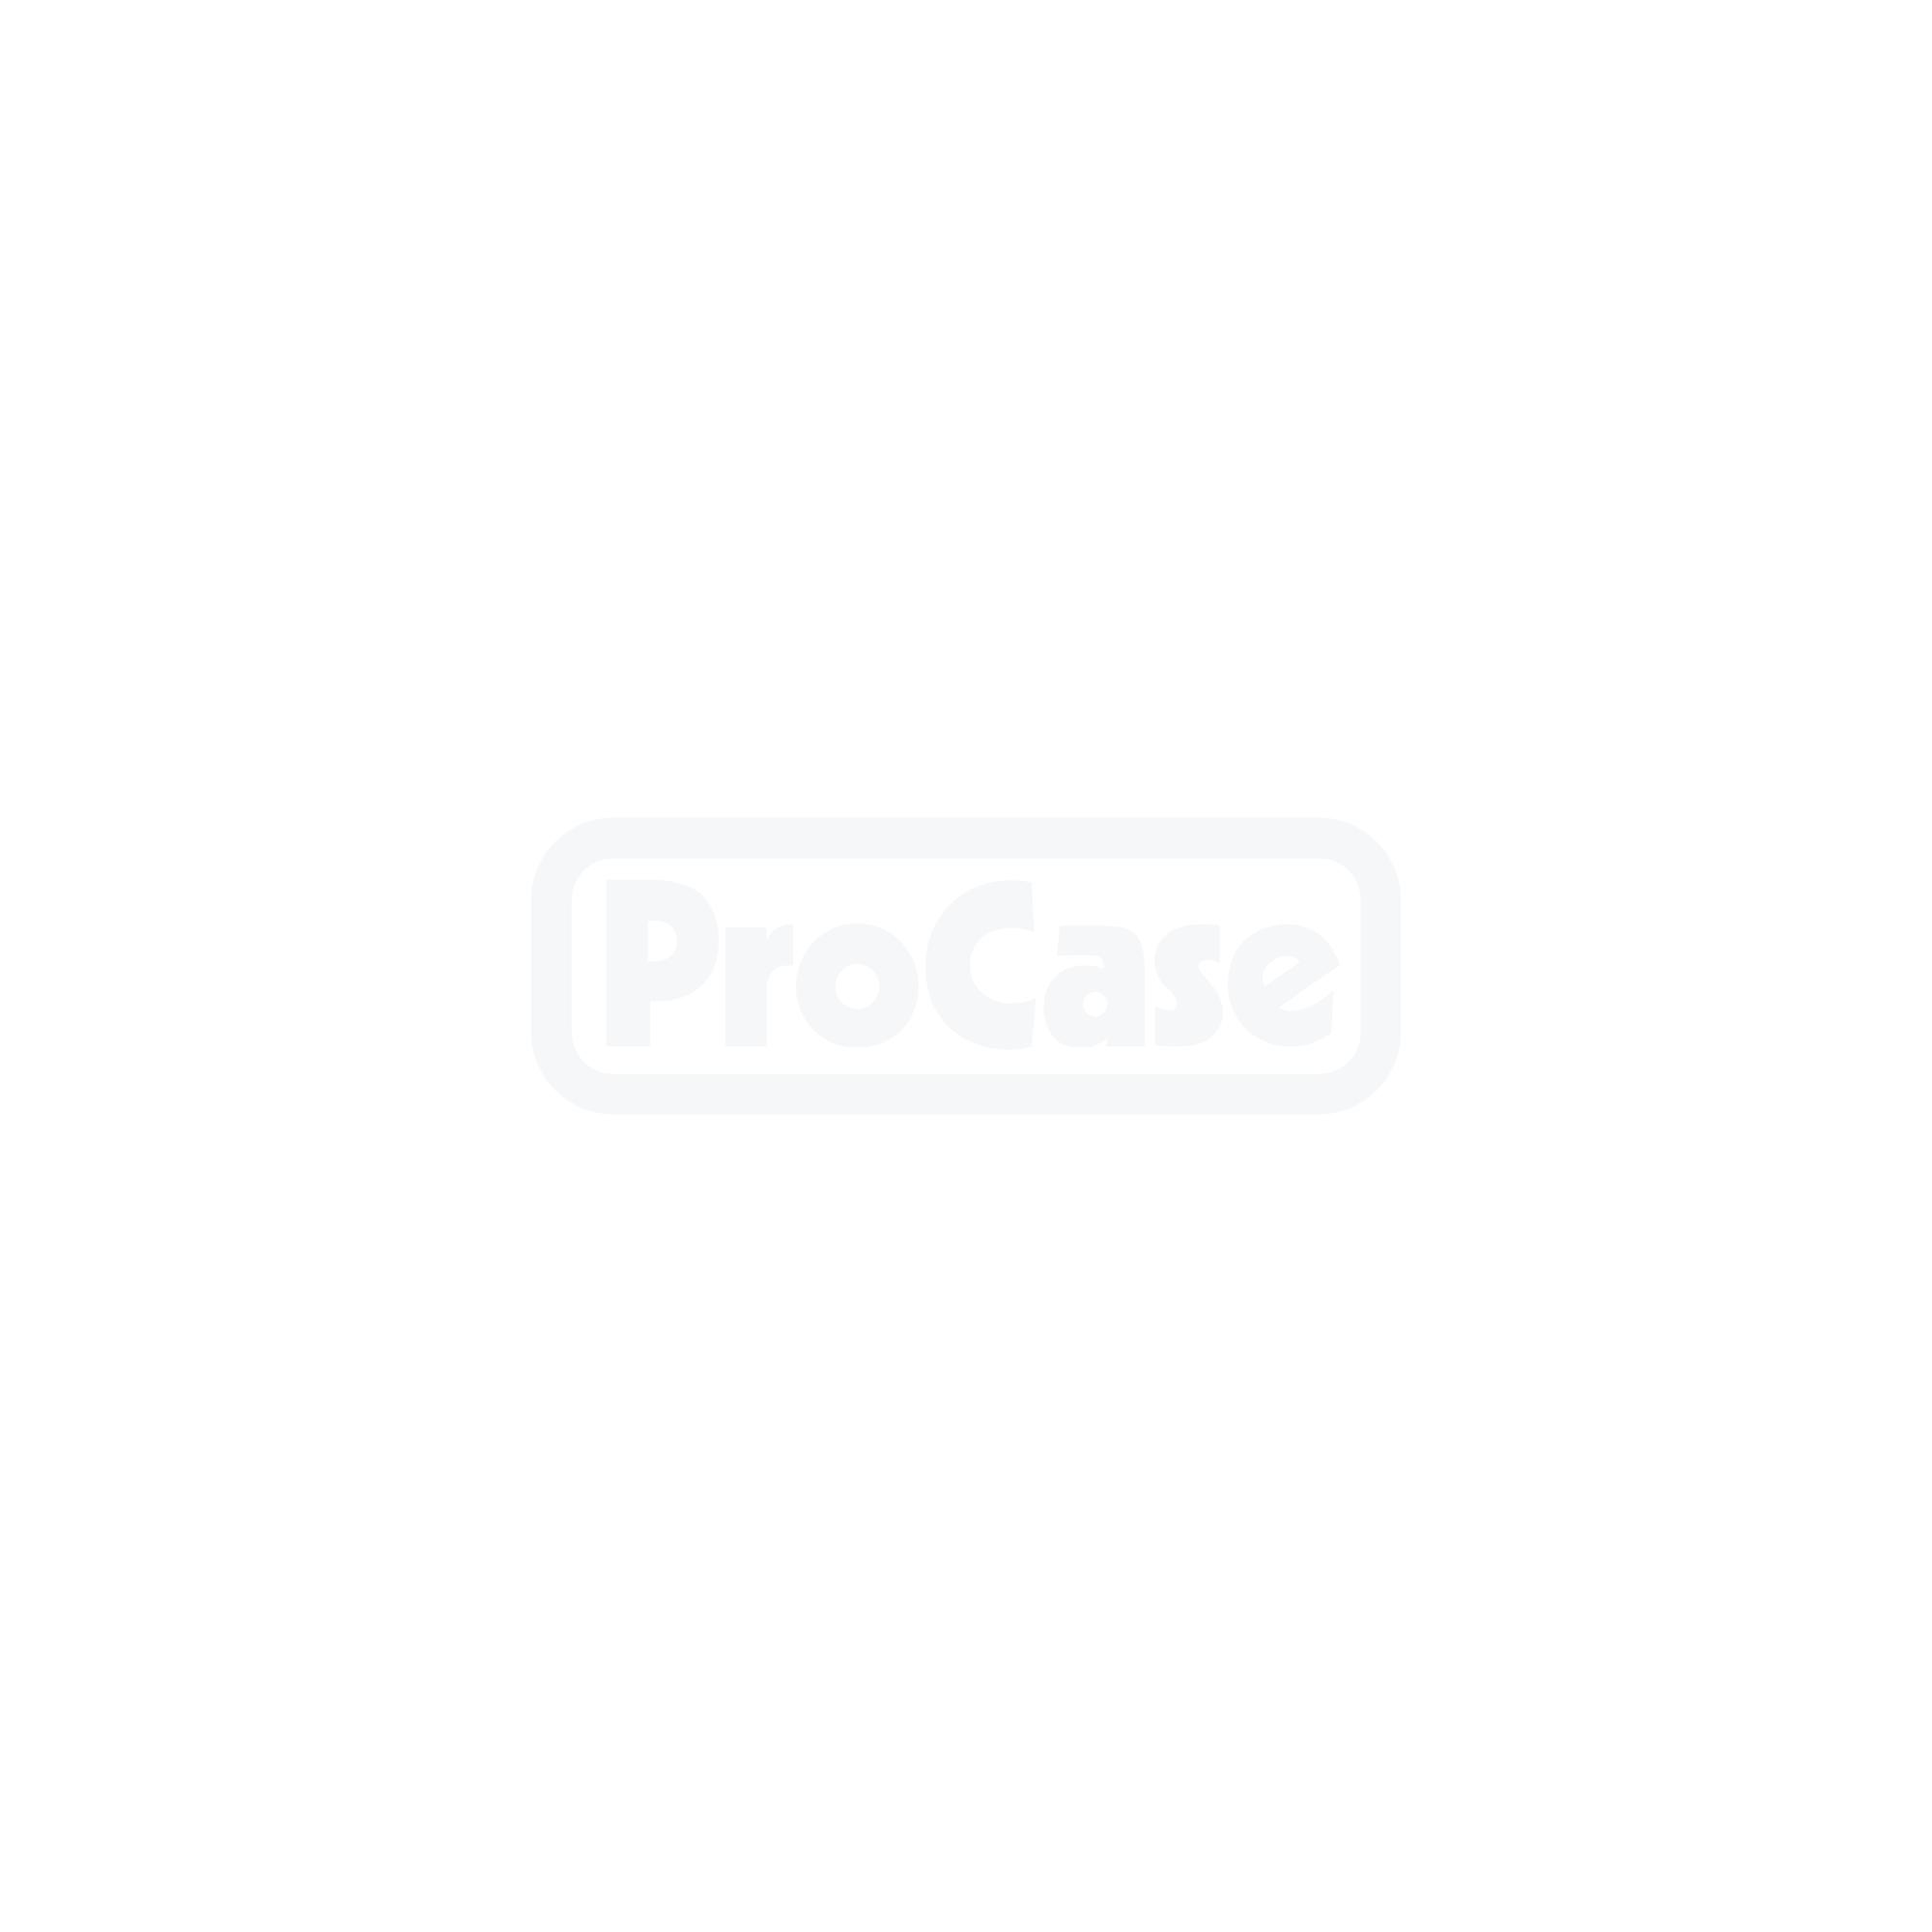 Flightcase für 6 Mikrofonstative + 6 Boxenstative 3